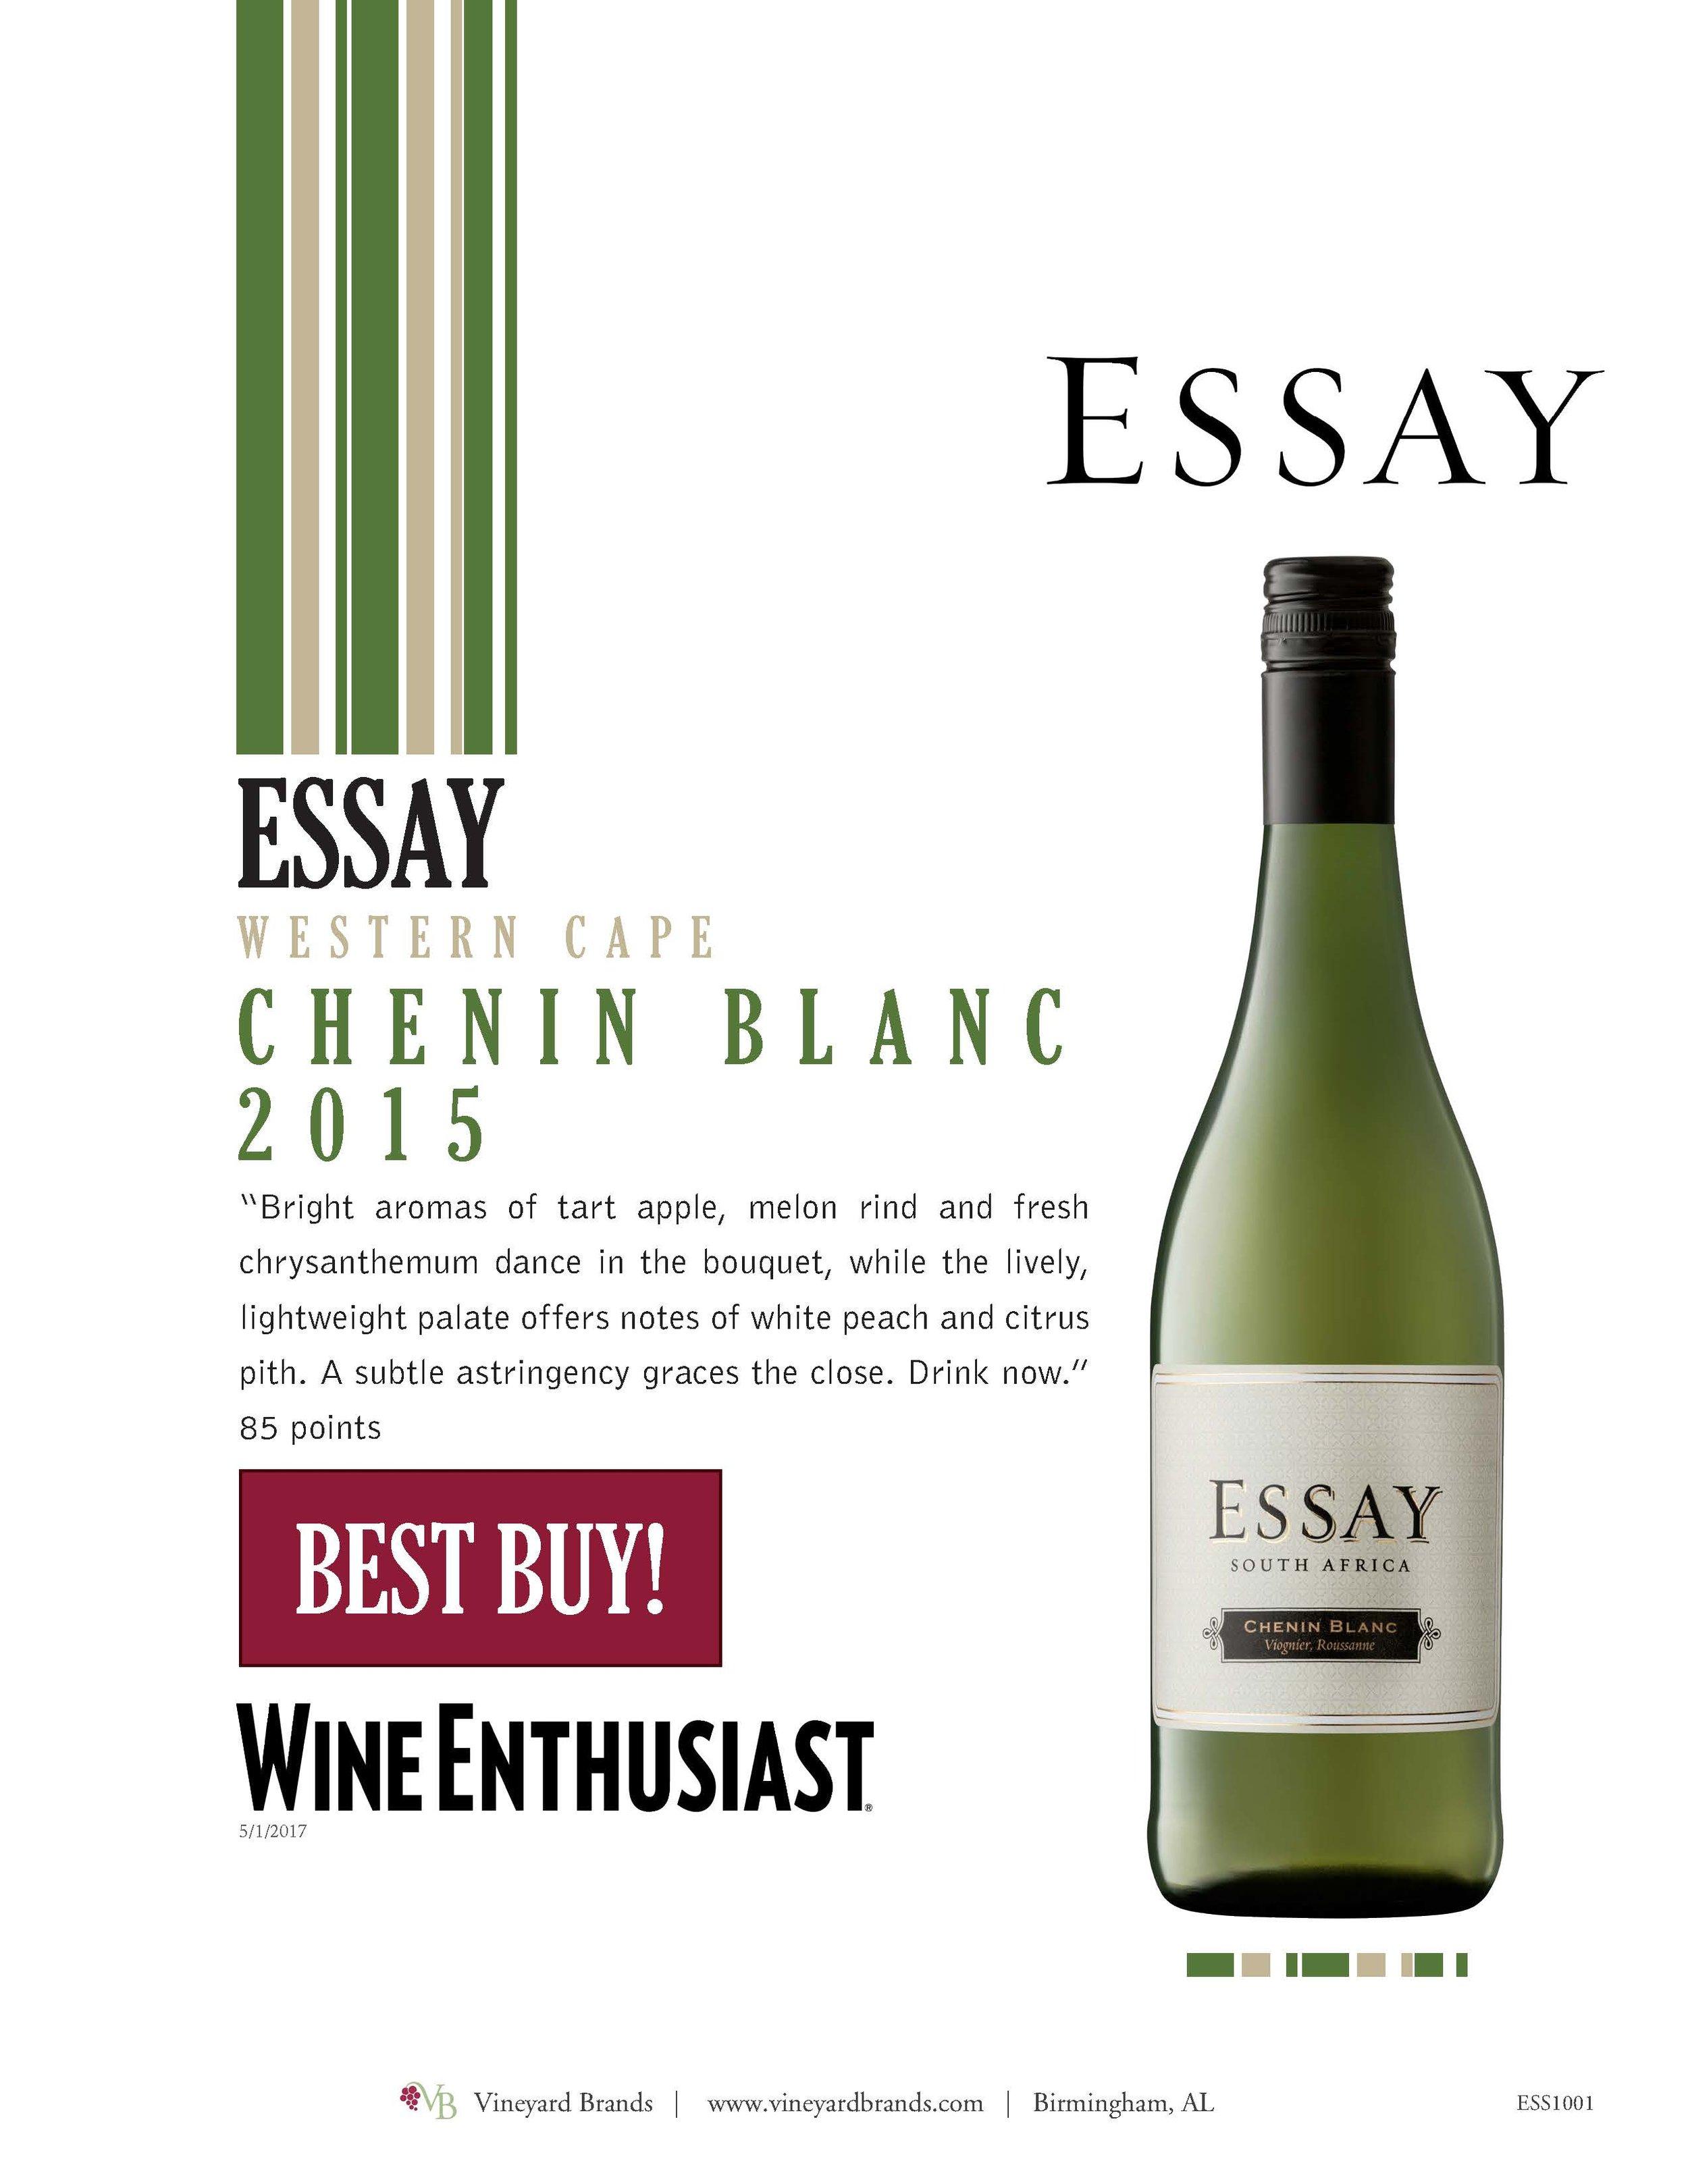 EssayCheninBlanc2015.jpg